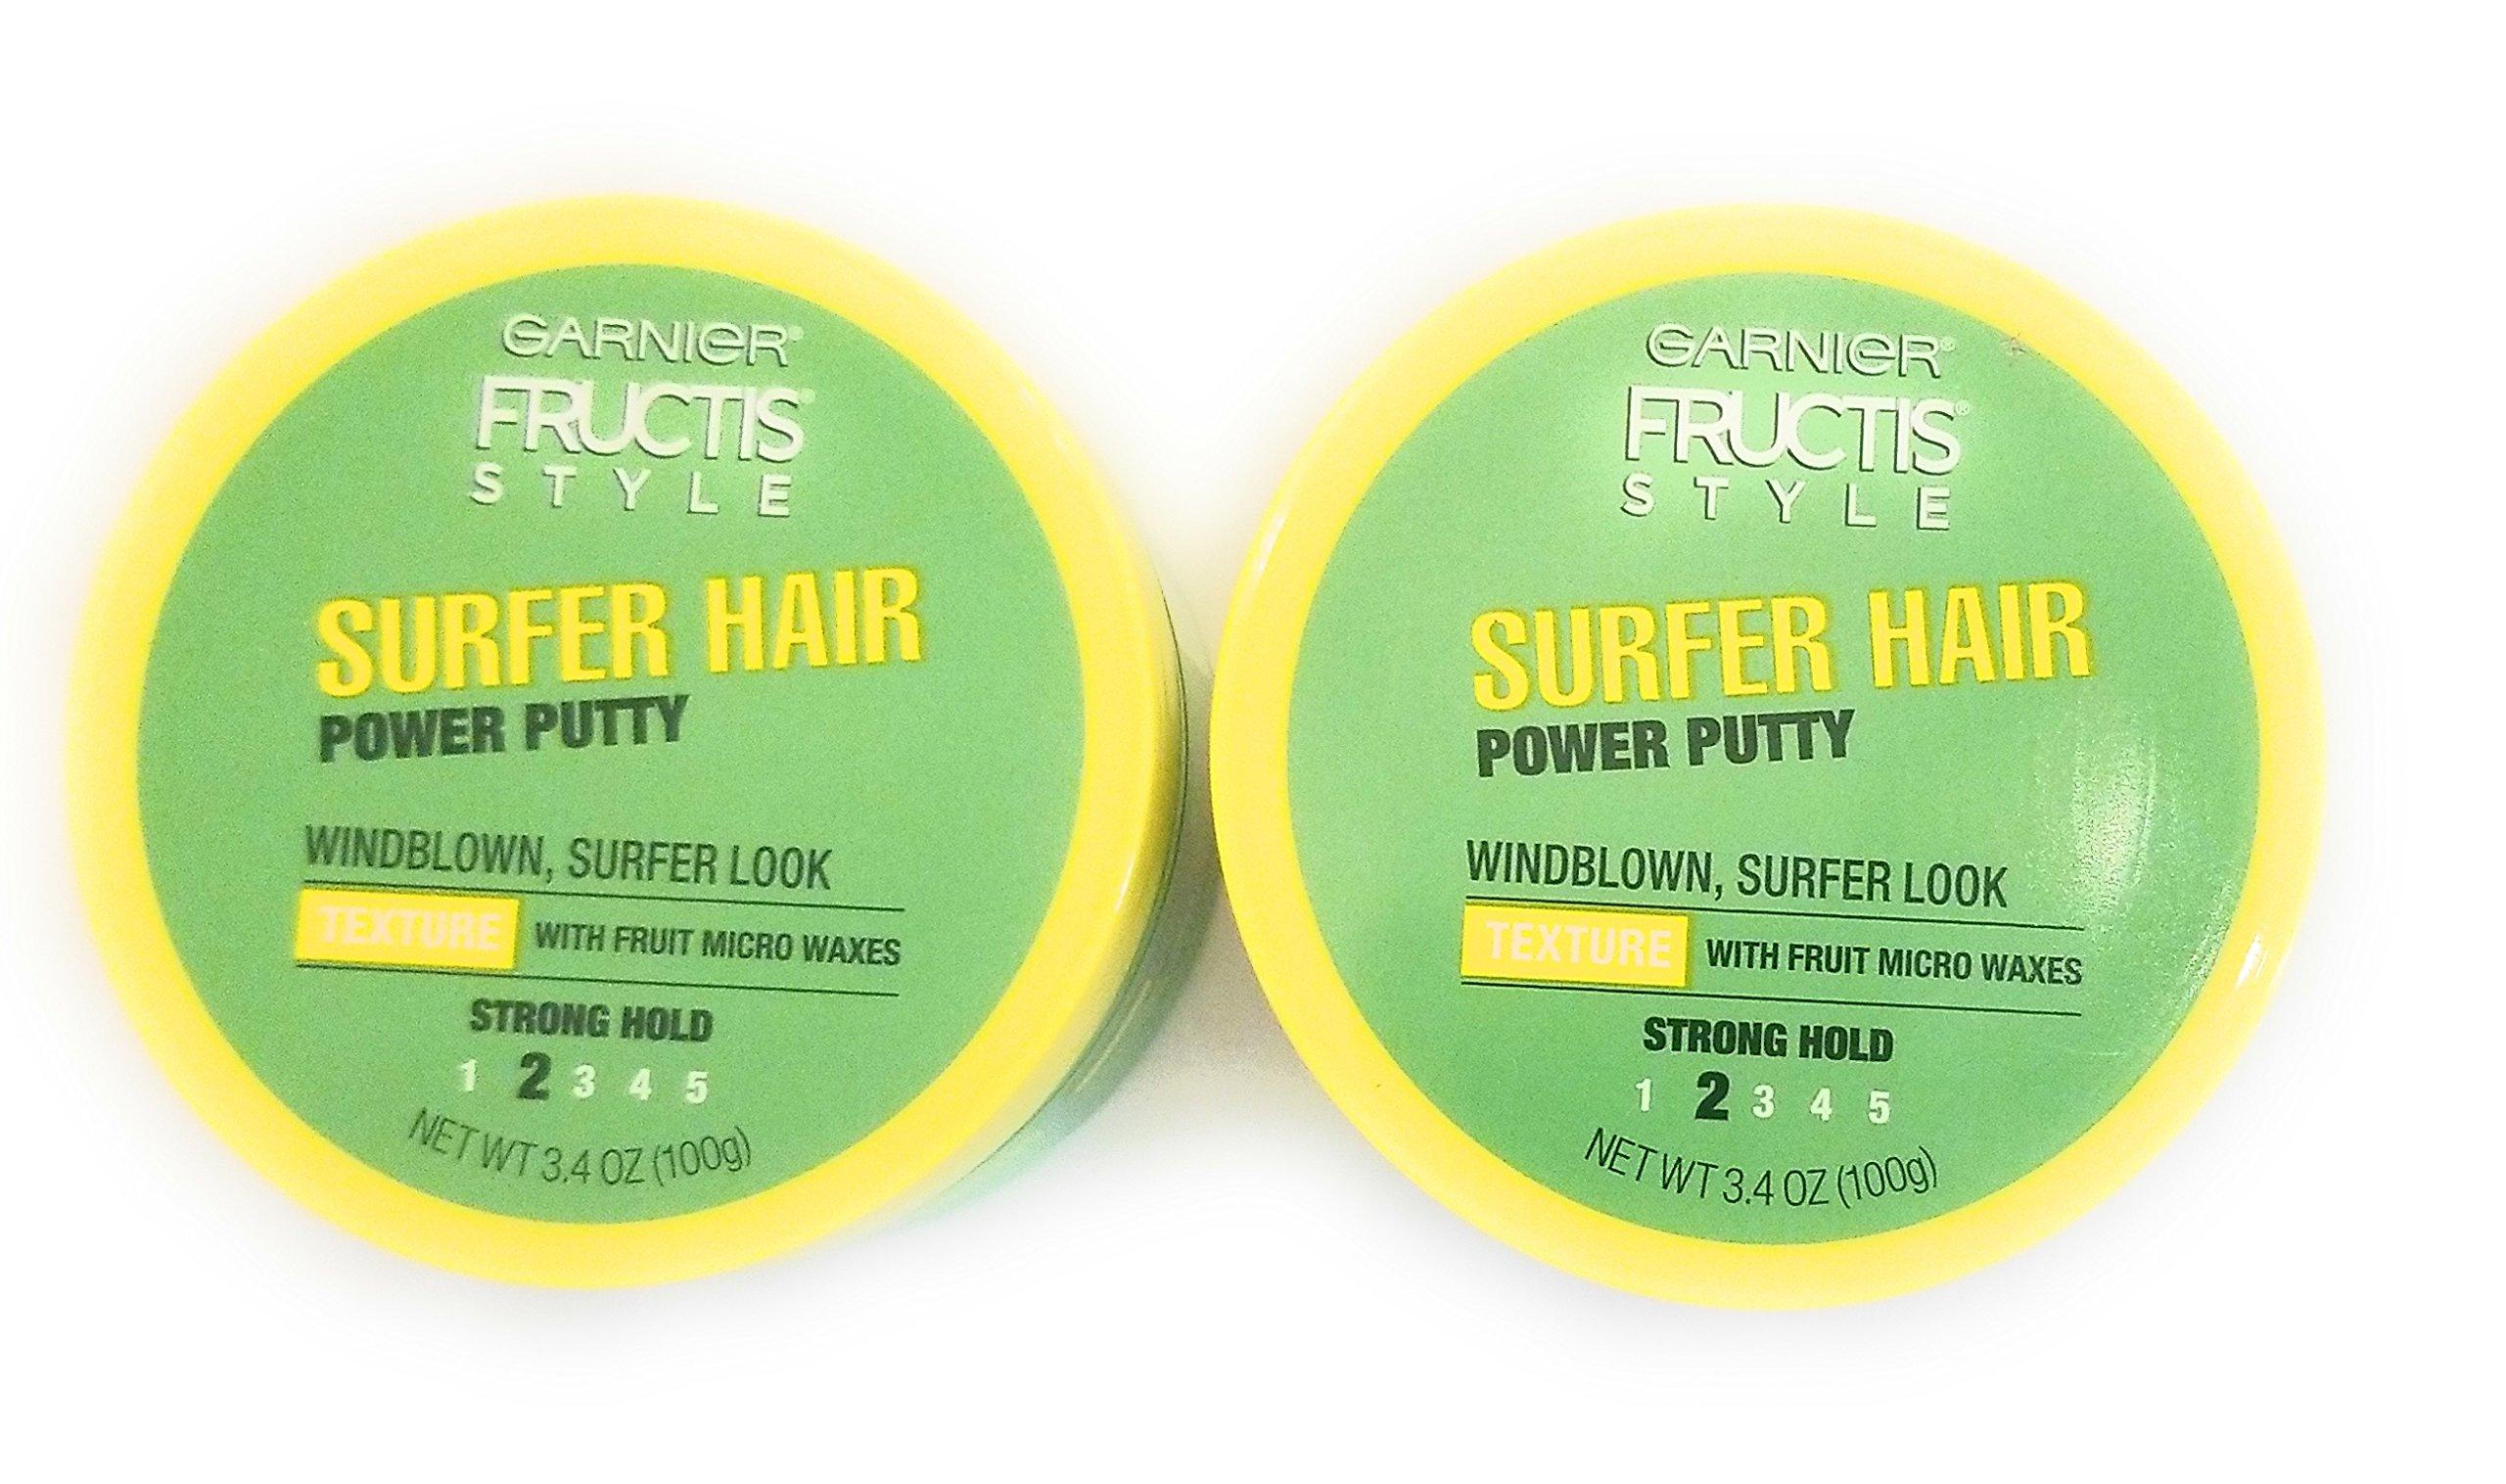 Garnier Fructis Style Surfer Hair Power Putty, 3 Ounce, 2 Pack